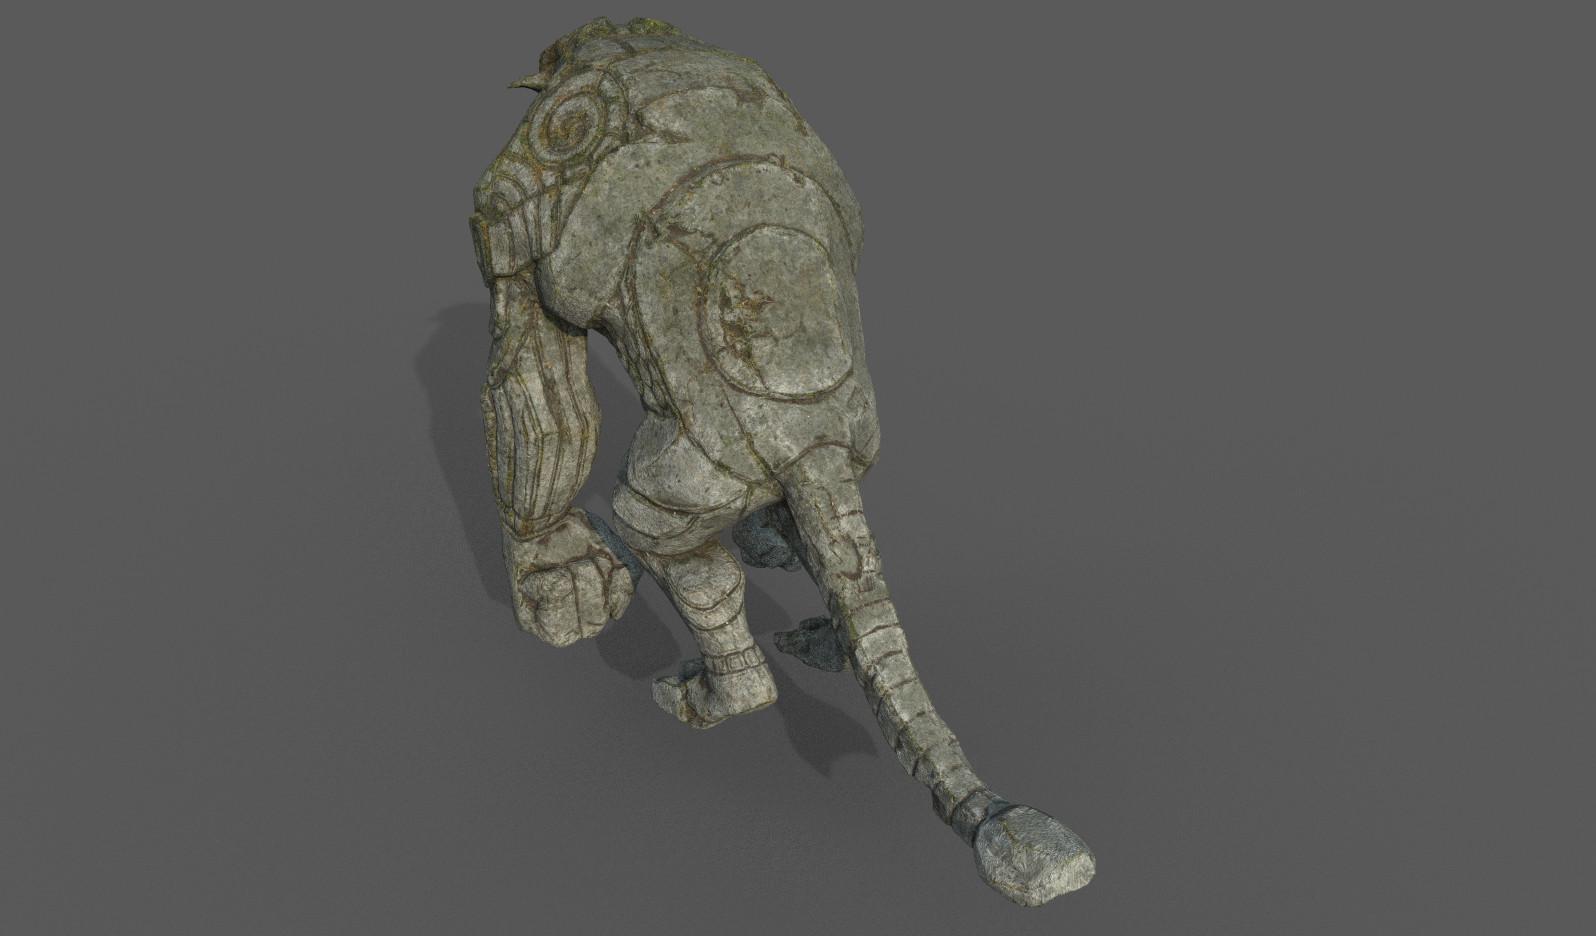 Darko mitev beast statuev1 03